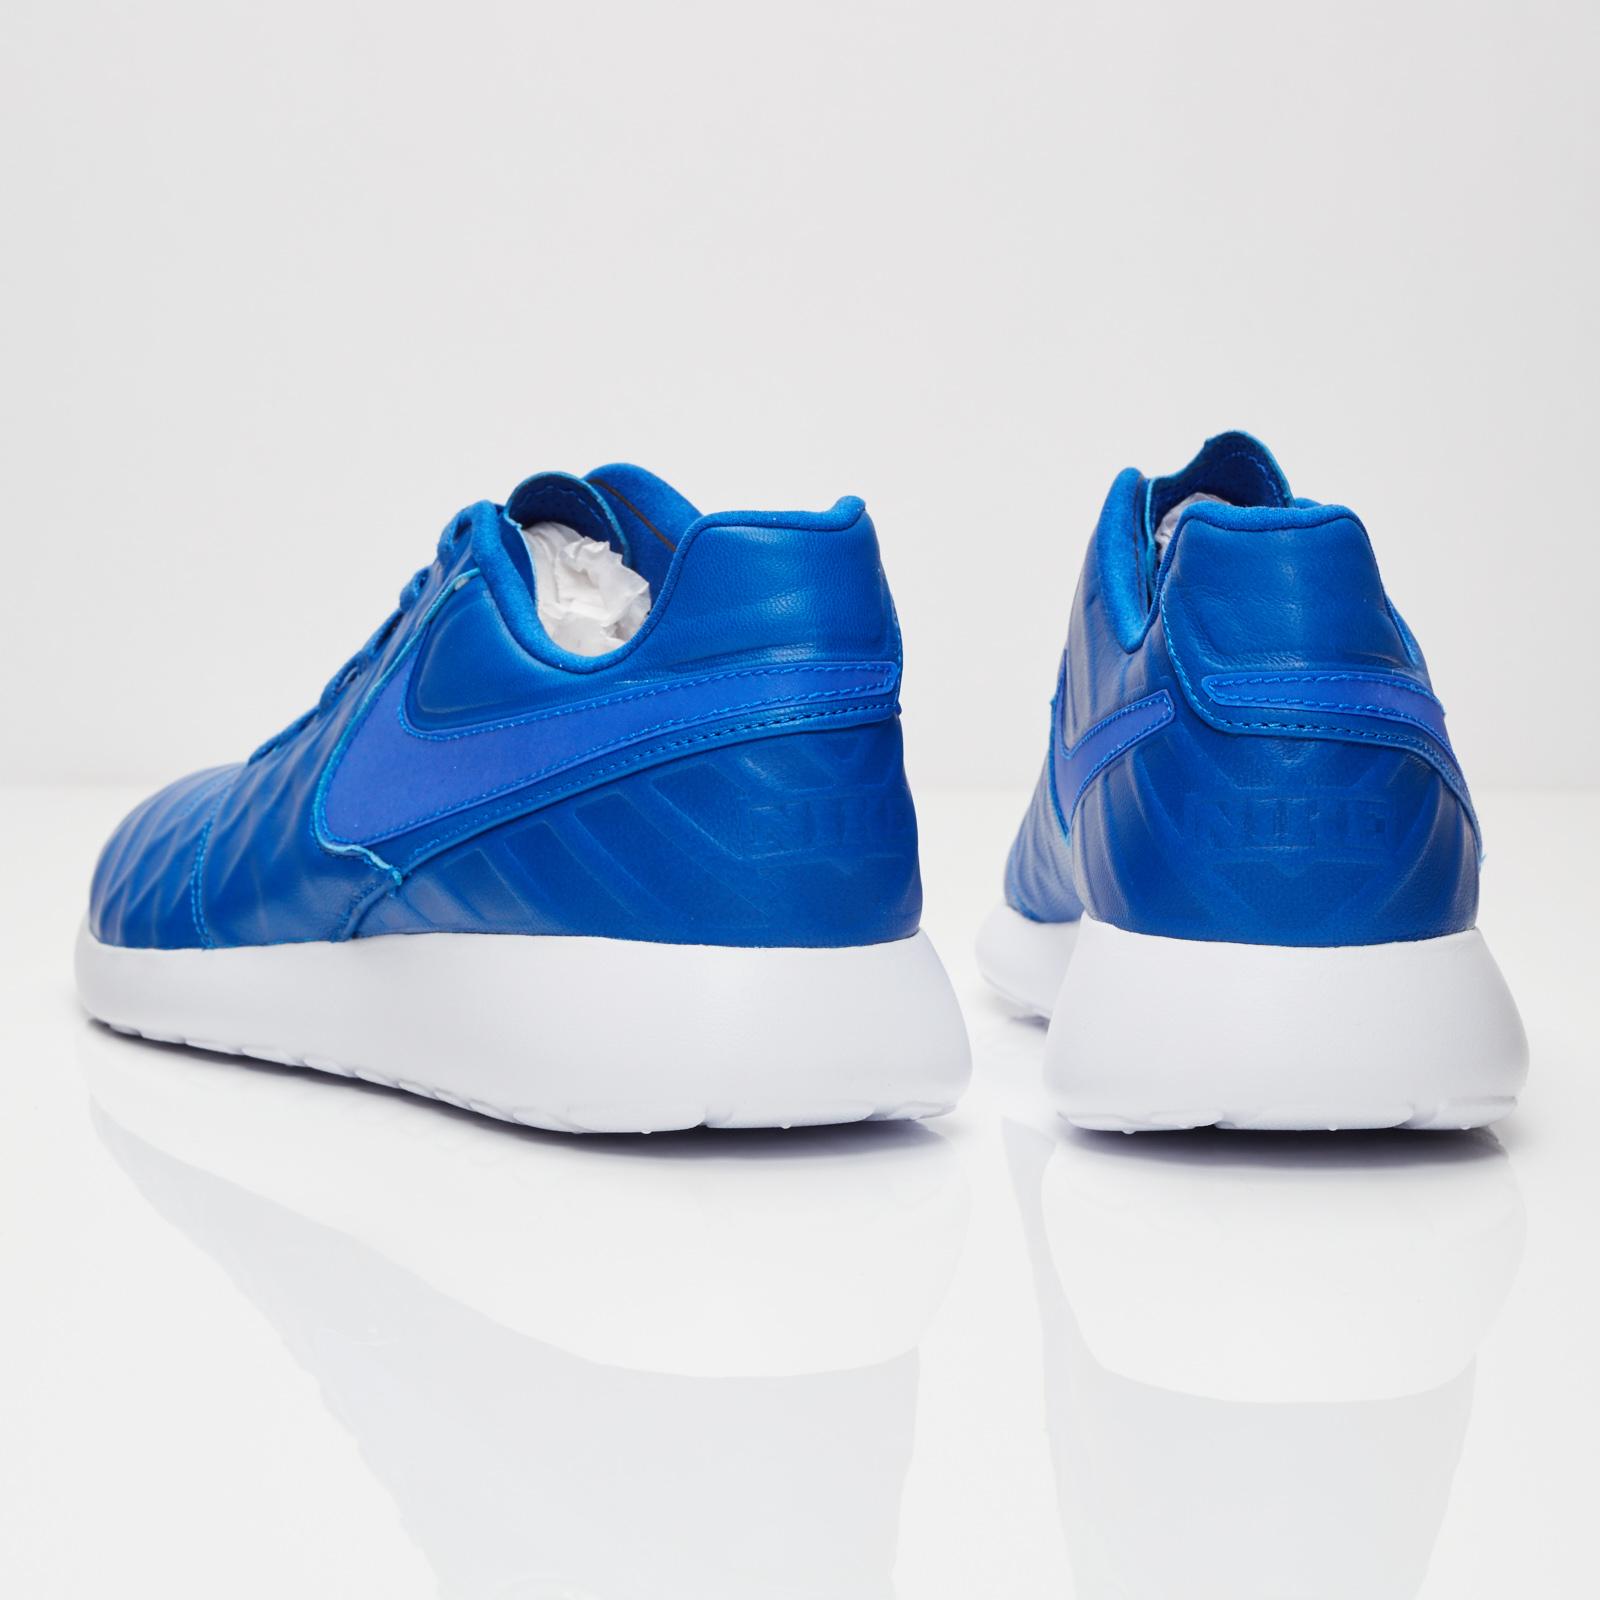 b5cce1e6d54af Nike Roshe Tiempo VI QS - 853535-447 - Sneakersnstuff